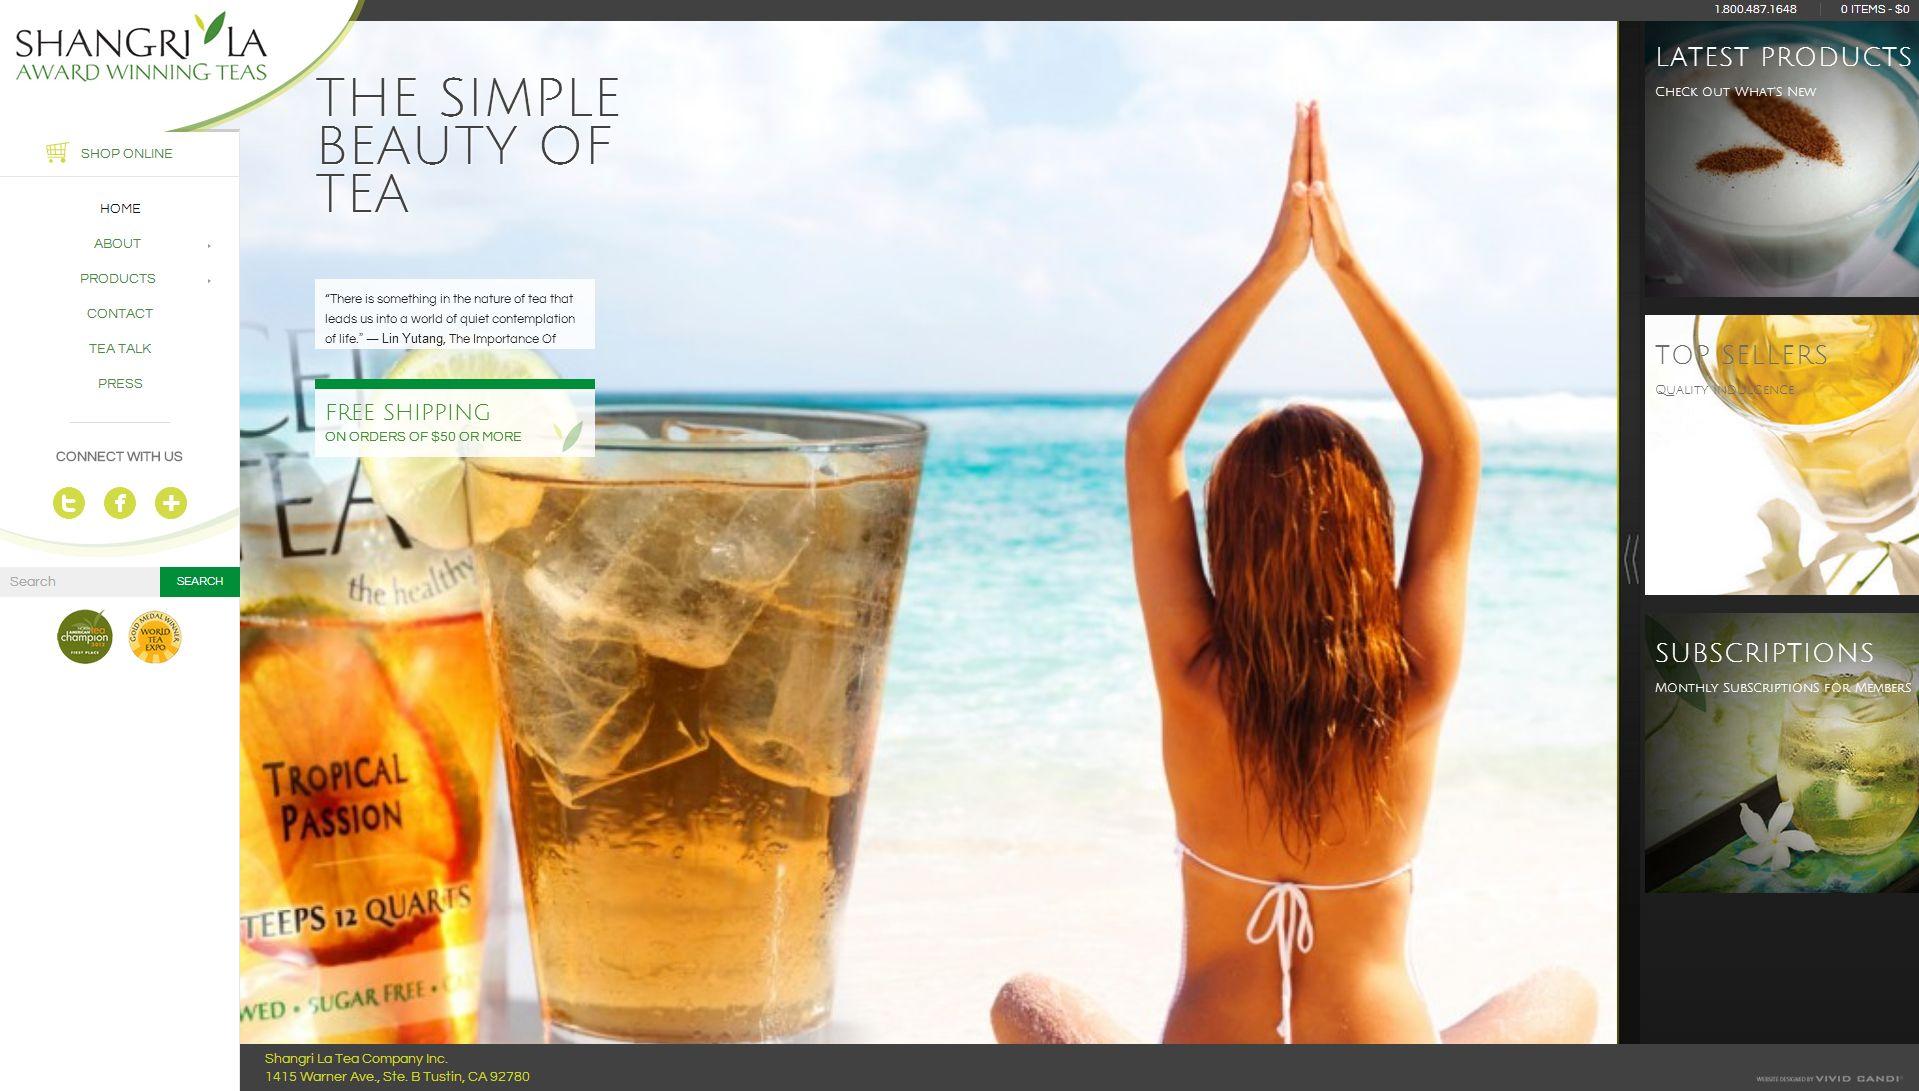 shangrila iced tea website